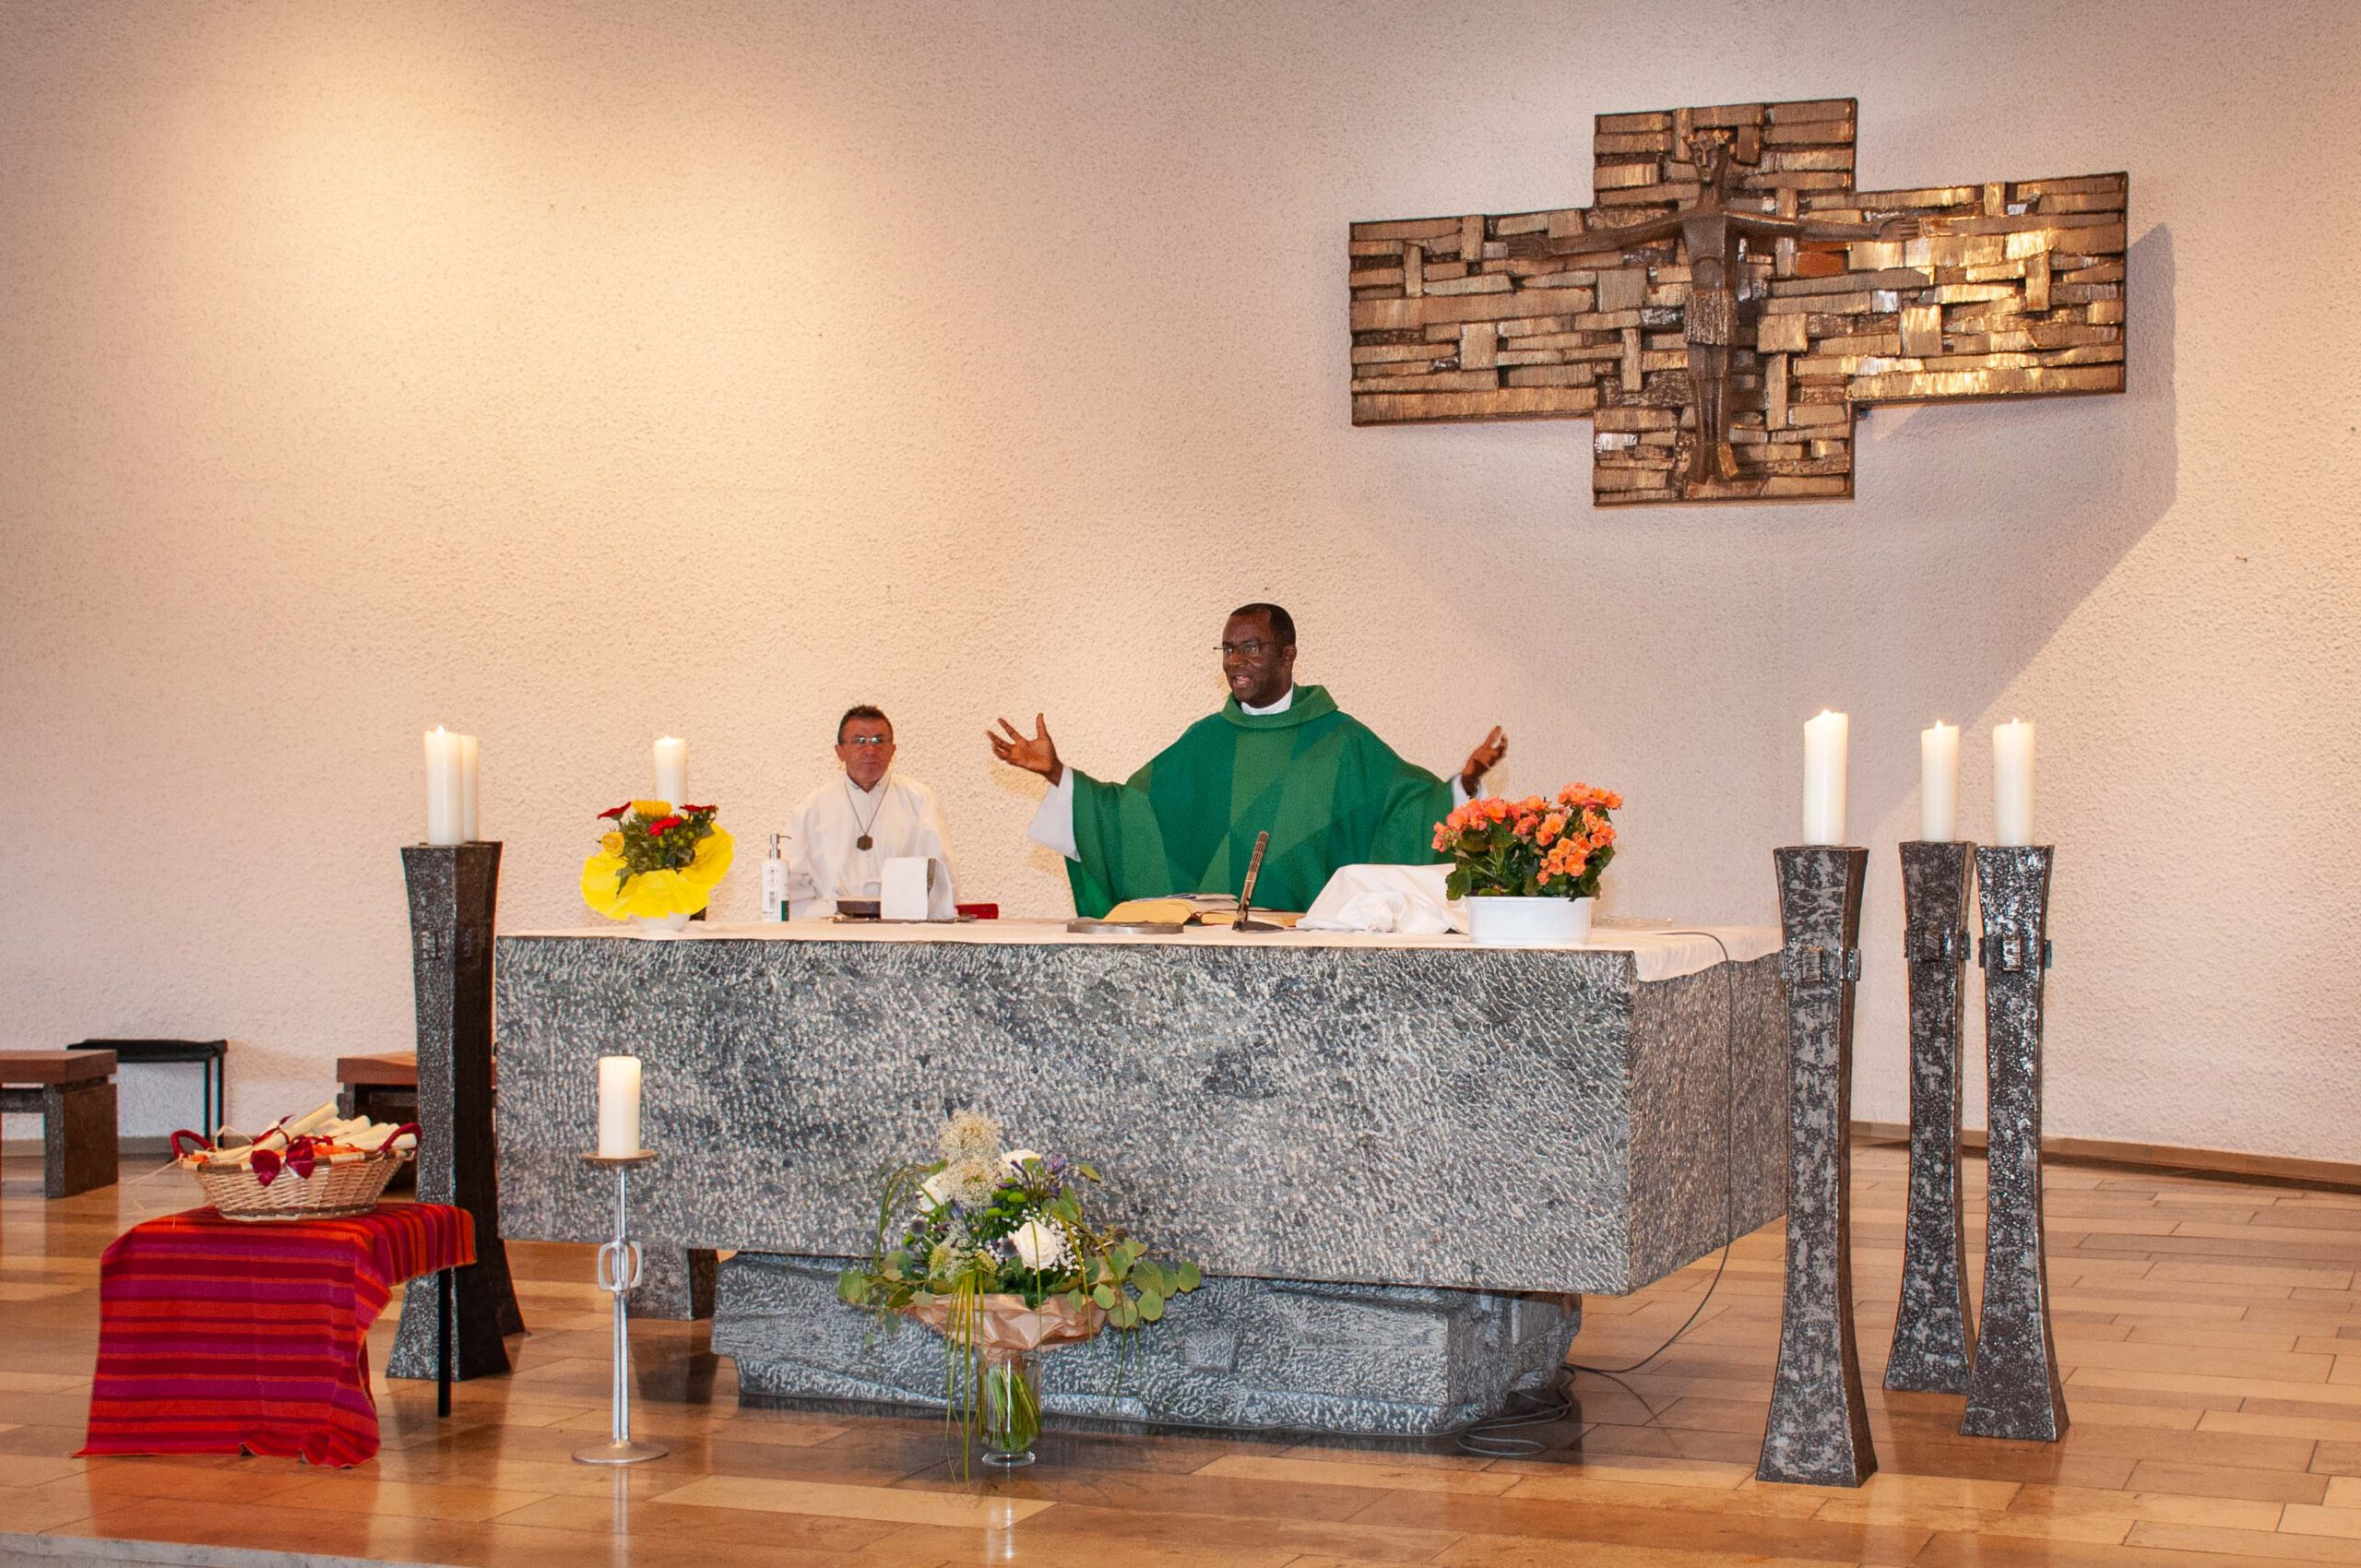 Celebrazione Santa Messa Esslingen Wernau